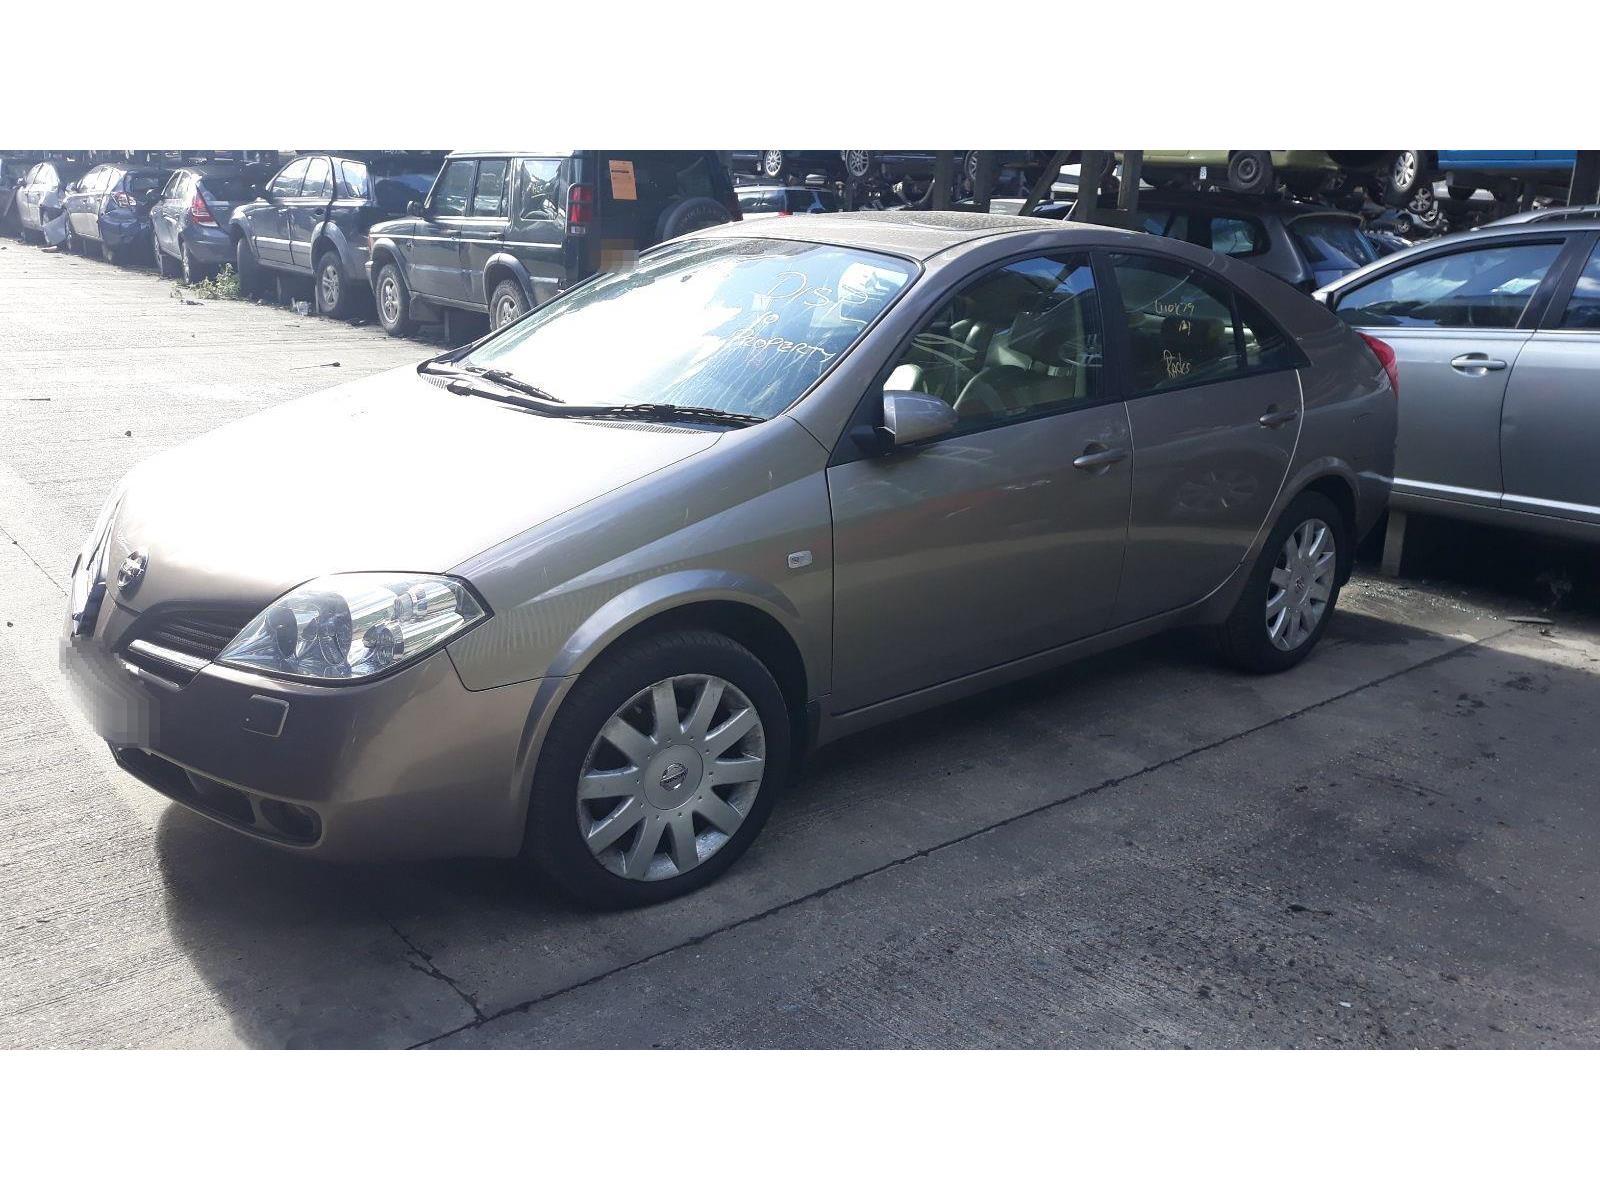 2004 Nissan Primera 2002 To 2007 T Spec 20l Automatic Petrol Beige Car Fuse Box Replacement